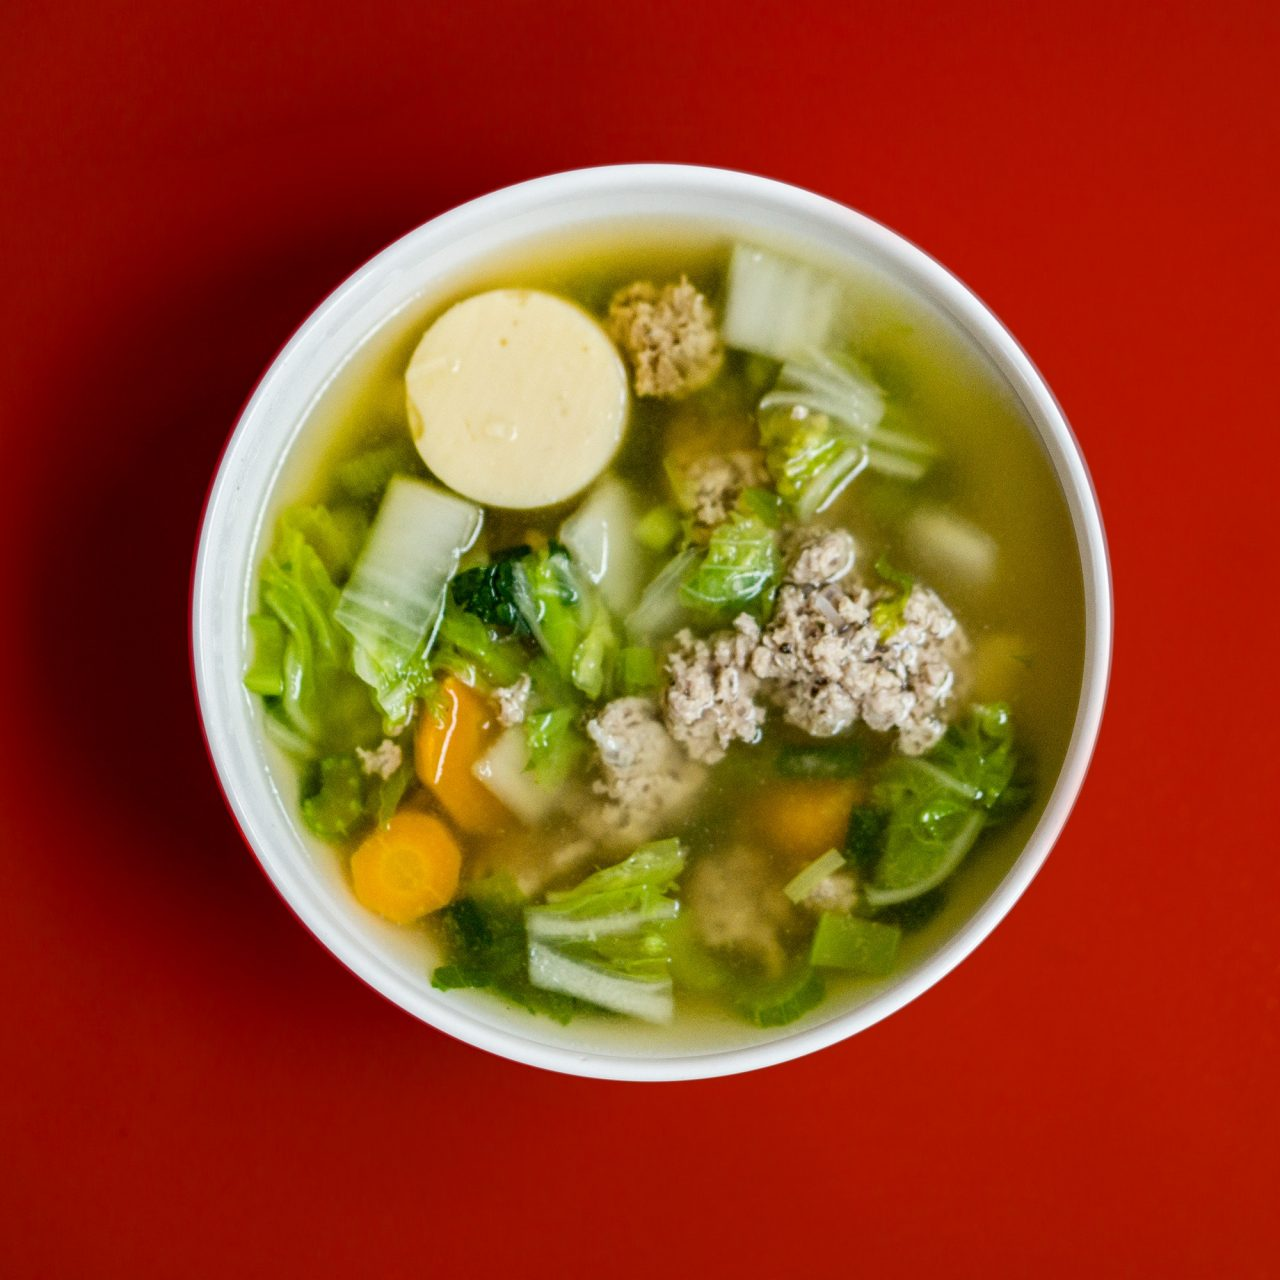 appetizer-asian-food-bowl-772518-1280x1280.jpg